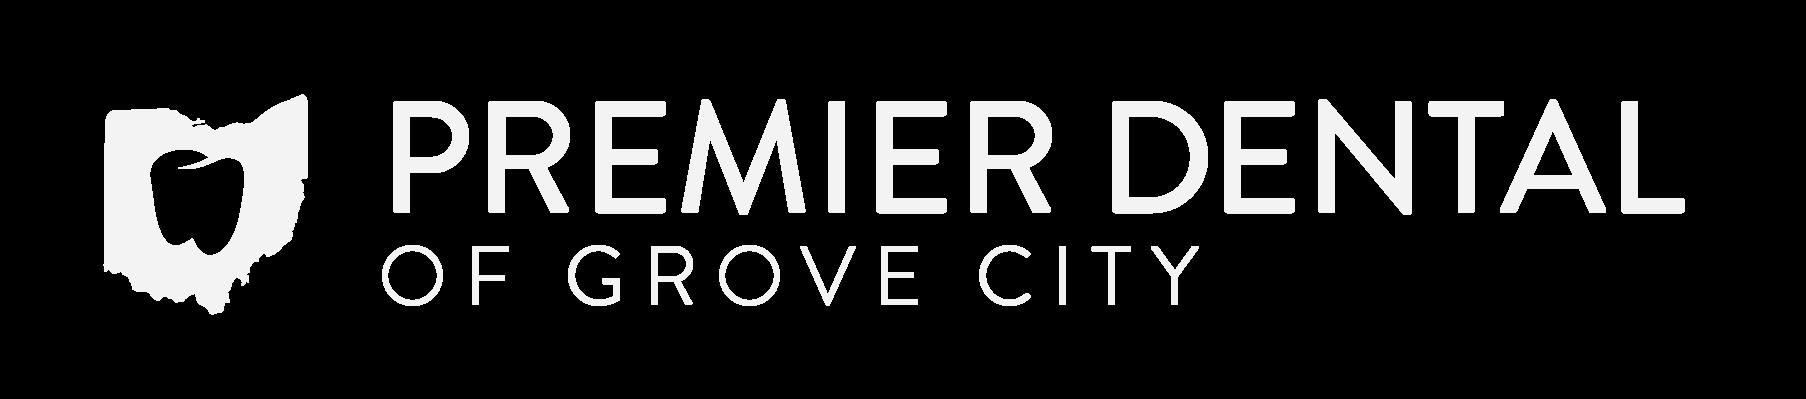 Premier Dental of Grove City